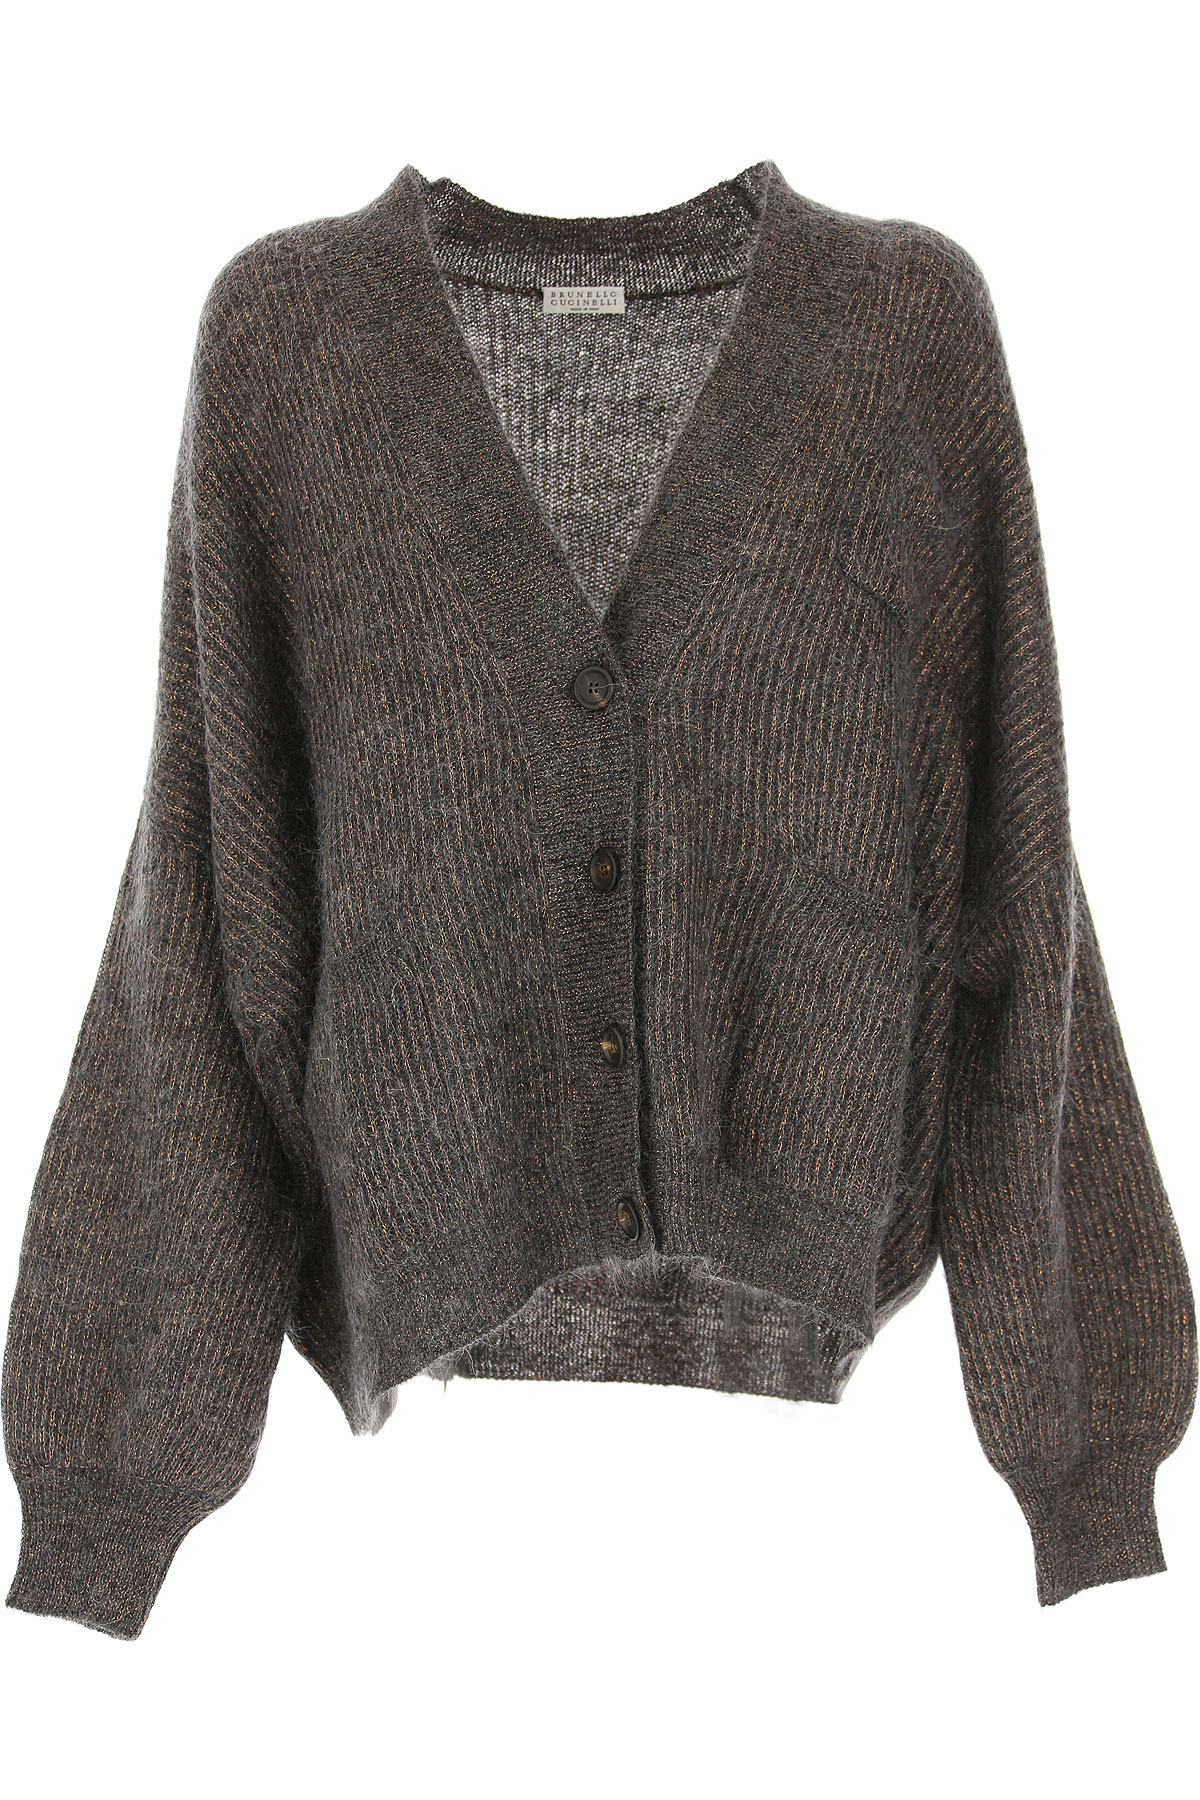 Brunello Cucinelli Sweater for Women Jumper On Sale, Grey, Mohair, 2019, 4 6